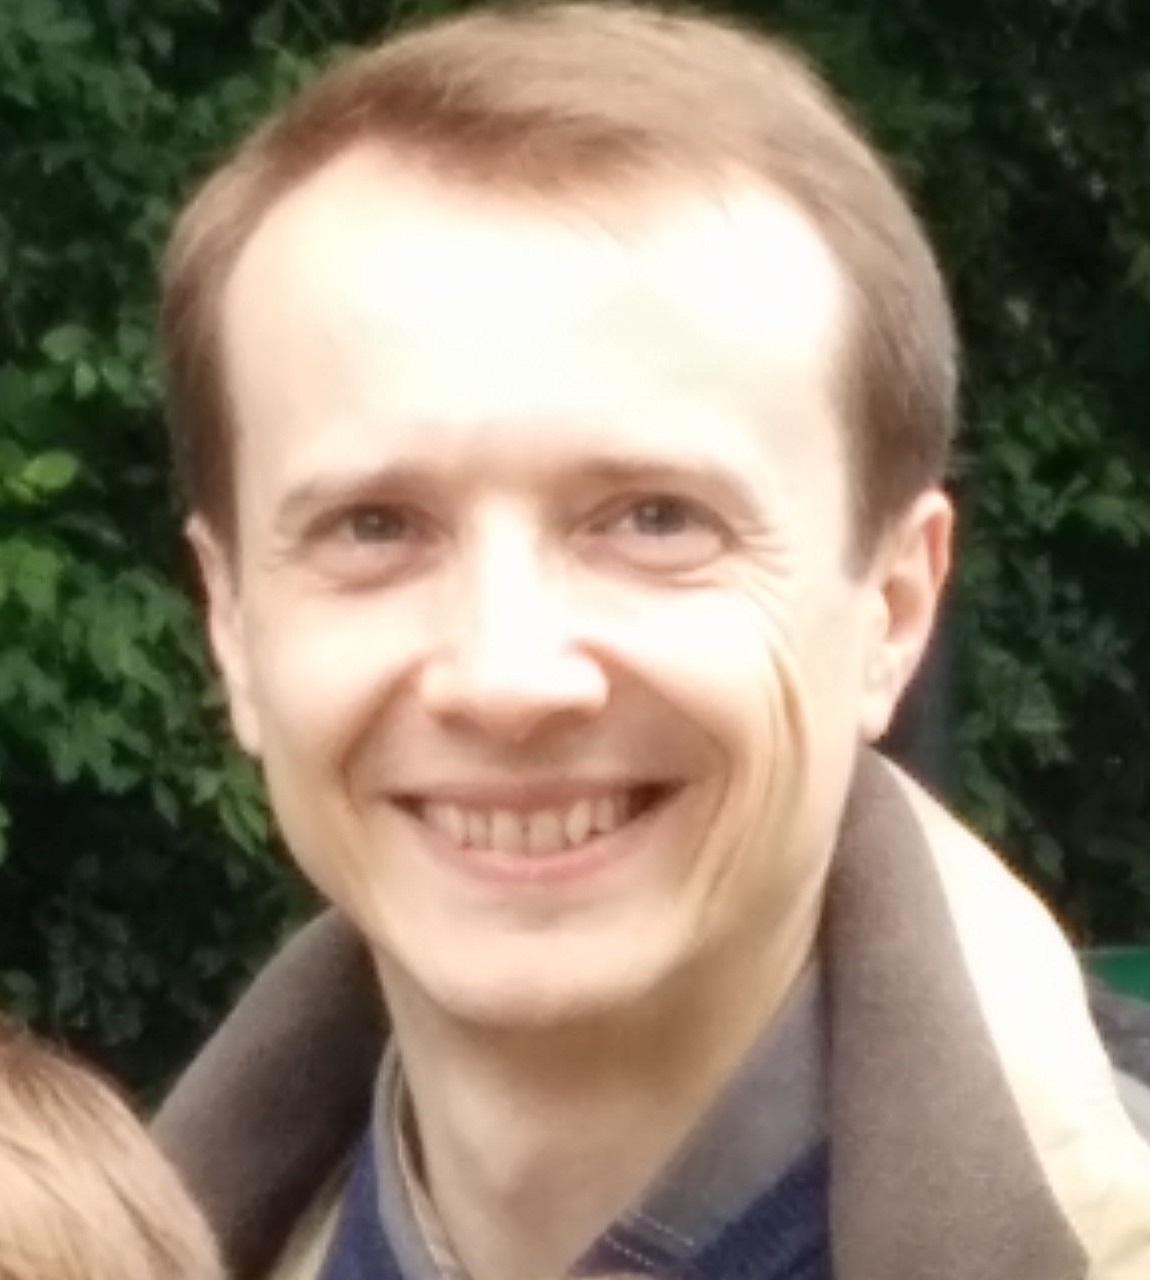 dr. sergie profile image